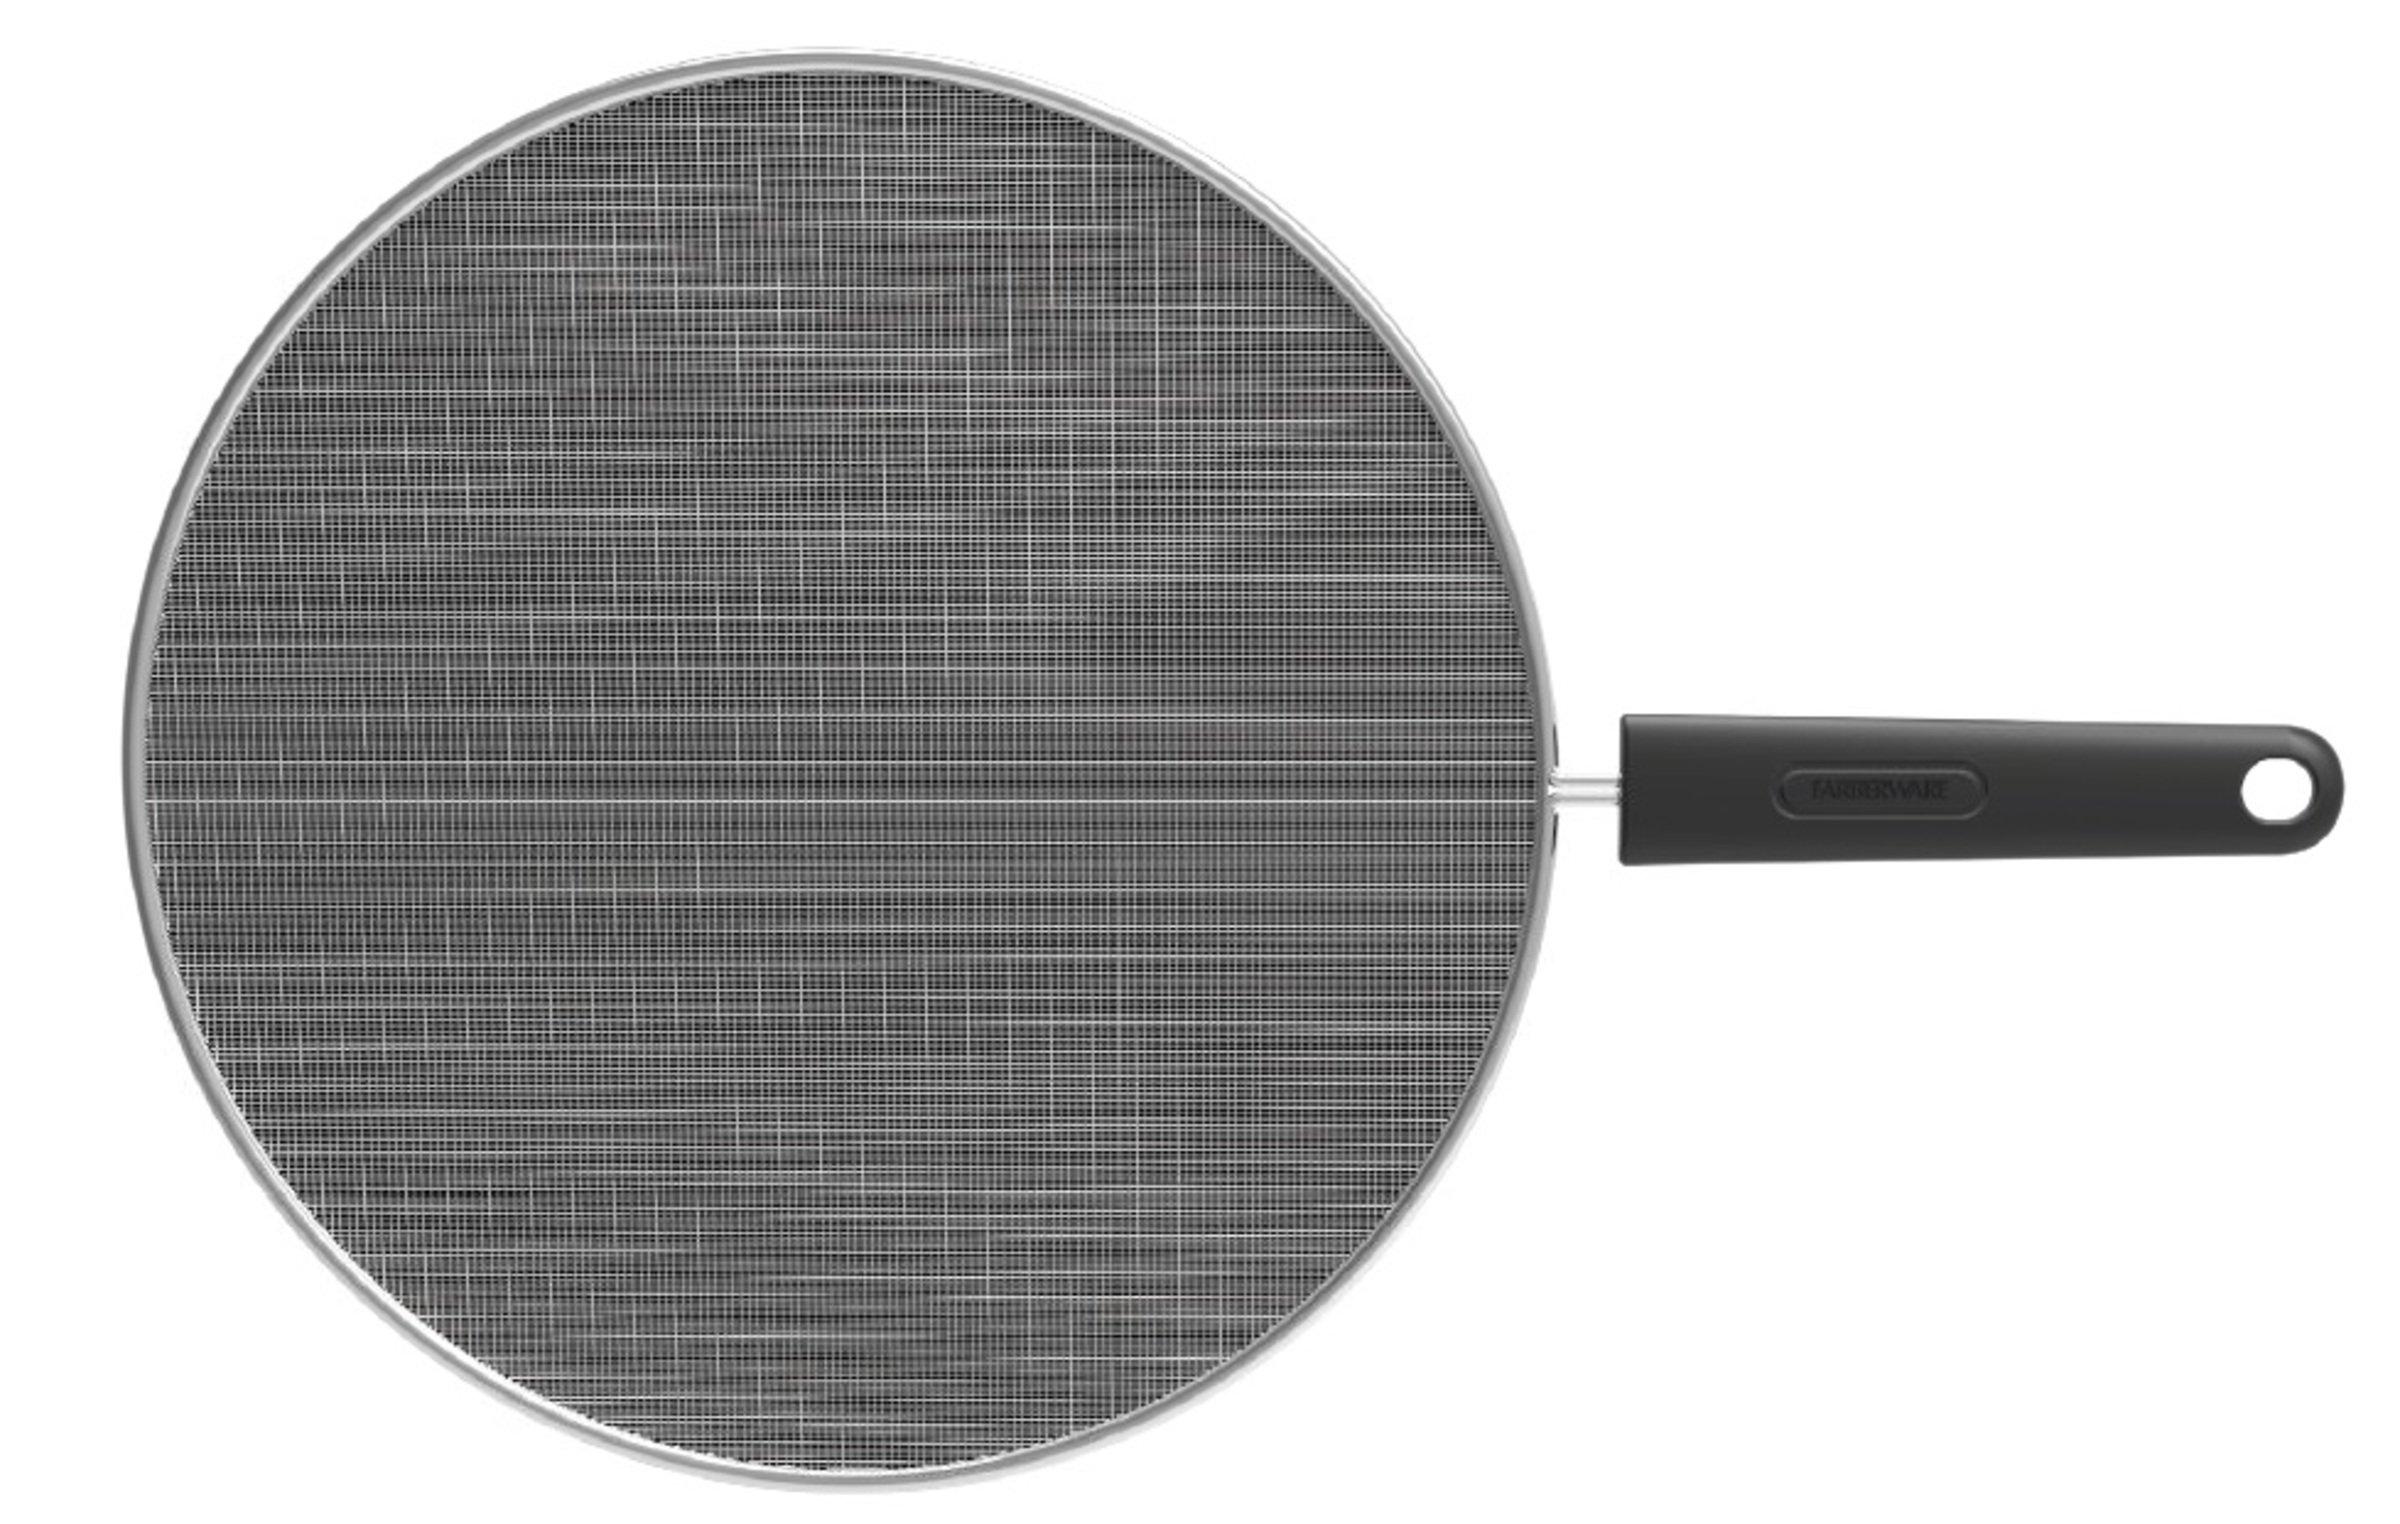 Farberware 5216173 Professional Stainless Steel Odor Absorbing Splatter Screen, 11-Inch